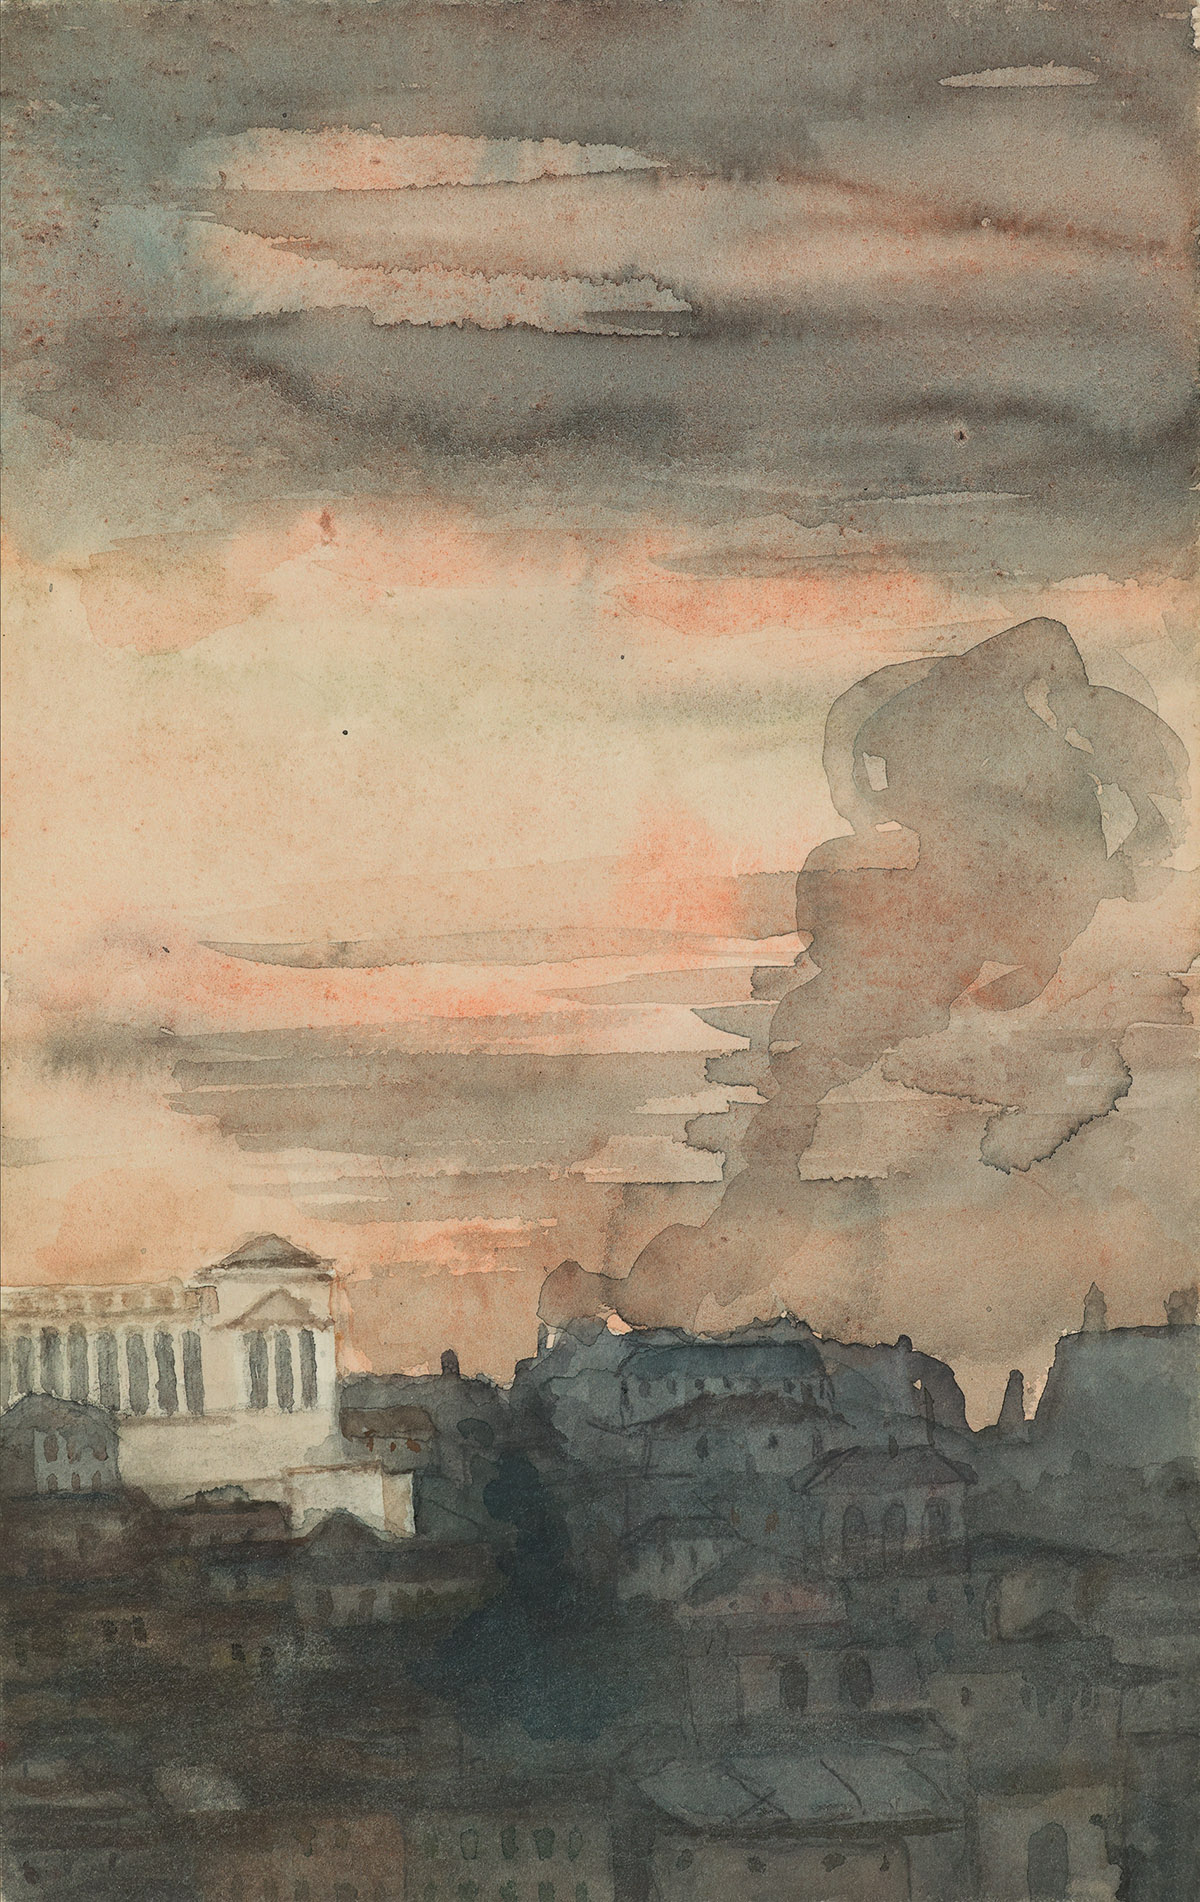 PAUL-ALBERT-BESNARD-(Paris-1849-1934-Paris)-A-View-of-Rome-w